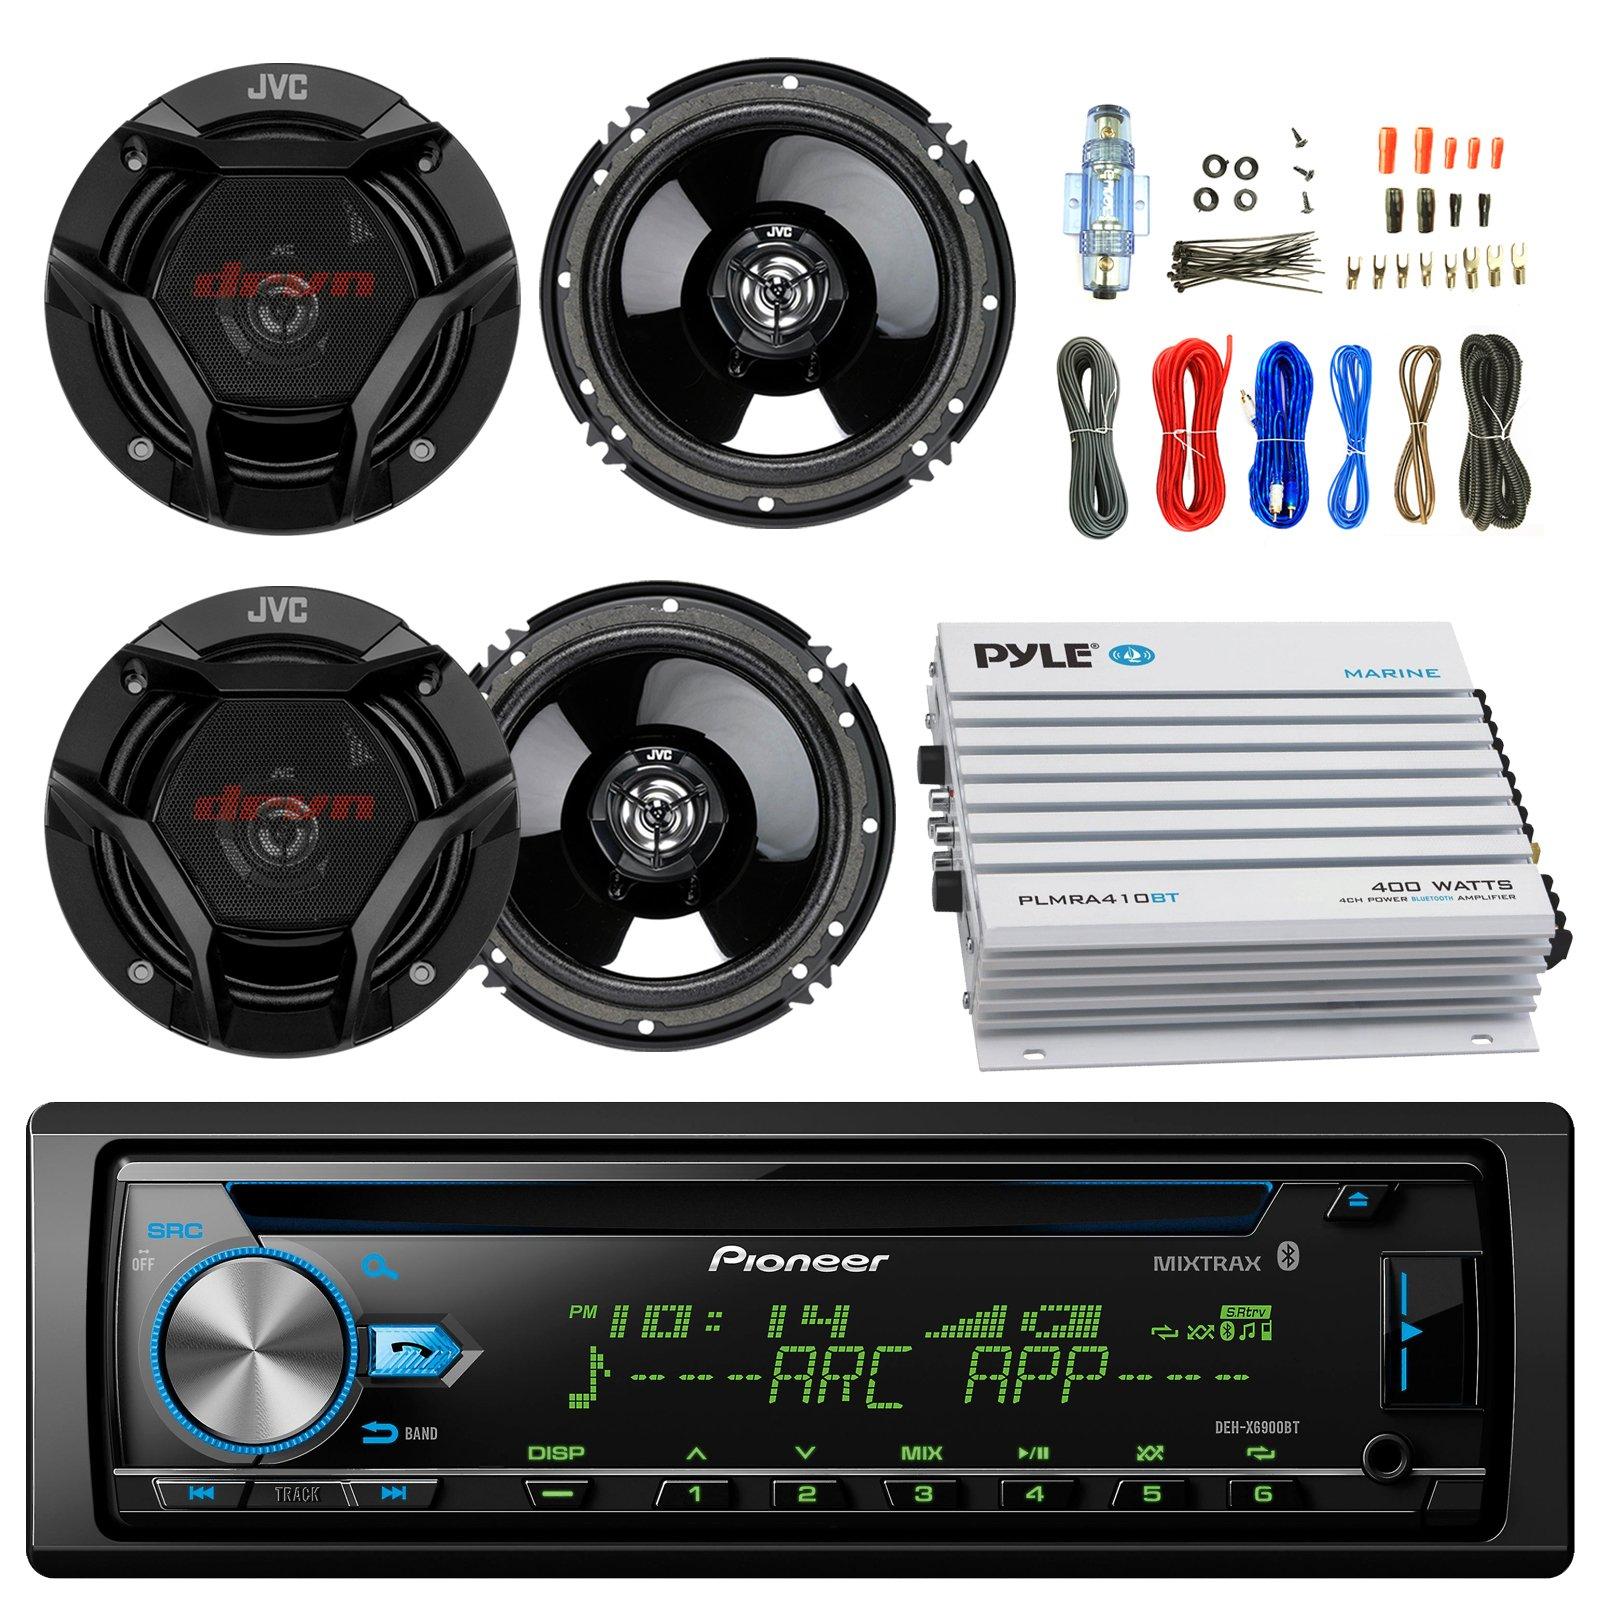 Pioneer DEH-X6900BT Car CD Player Receiver Bluetooth USB AUX Radio - Bundle Combo With 4x JVC CSDR620 6.5'' Inch 300-Watt 2-Way Black Audio Coaxial Speakers + + 4-Channel Amplifier + Amp Kit by EnrockAutomotiveBundle